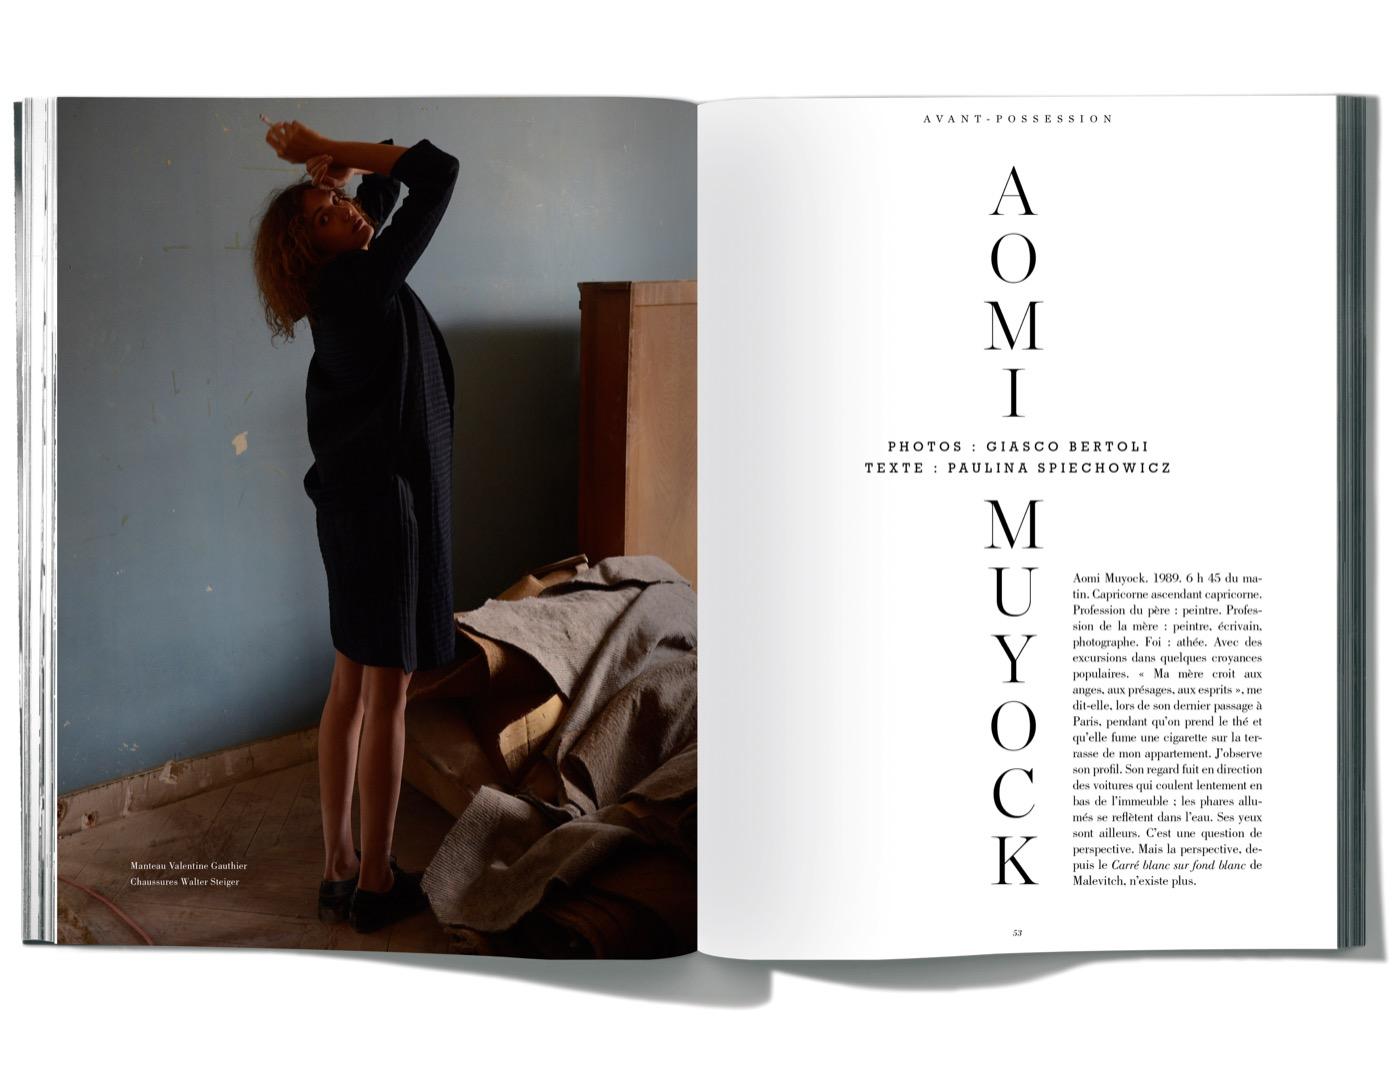 Texte de Paulina Spiechowicz & photographies de Giasco Bertoli, Aomi Muyock